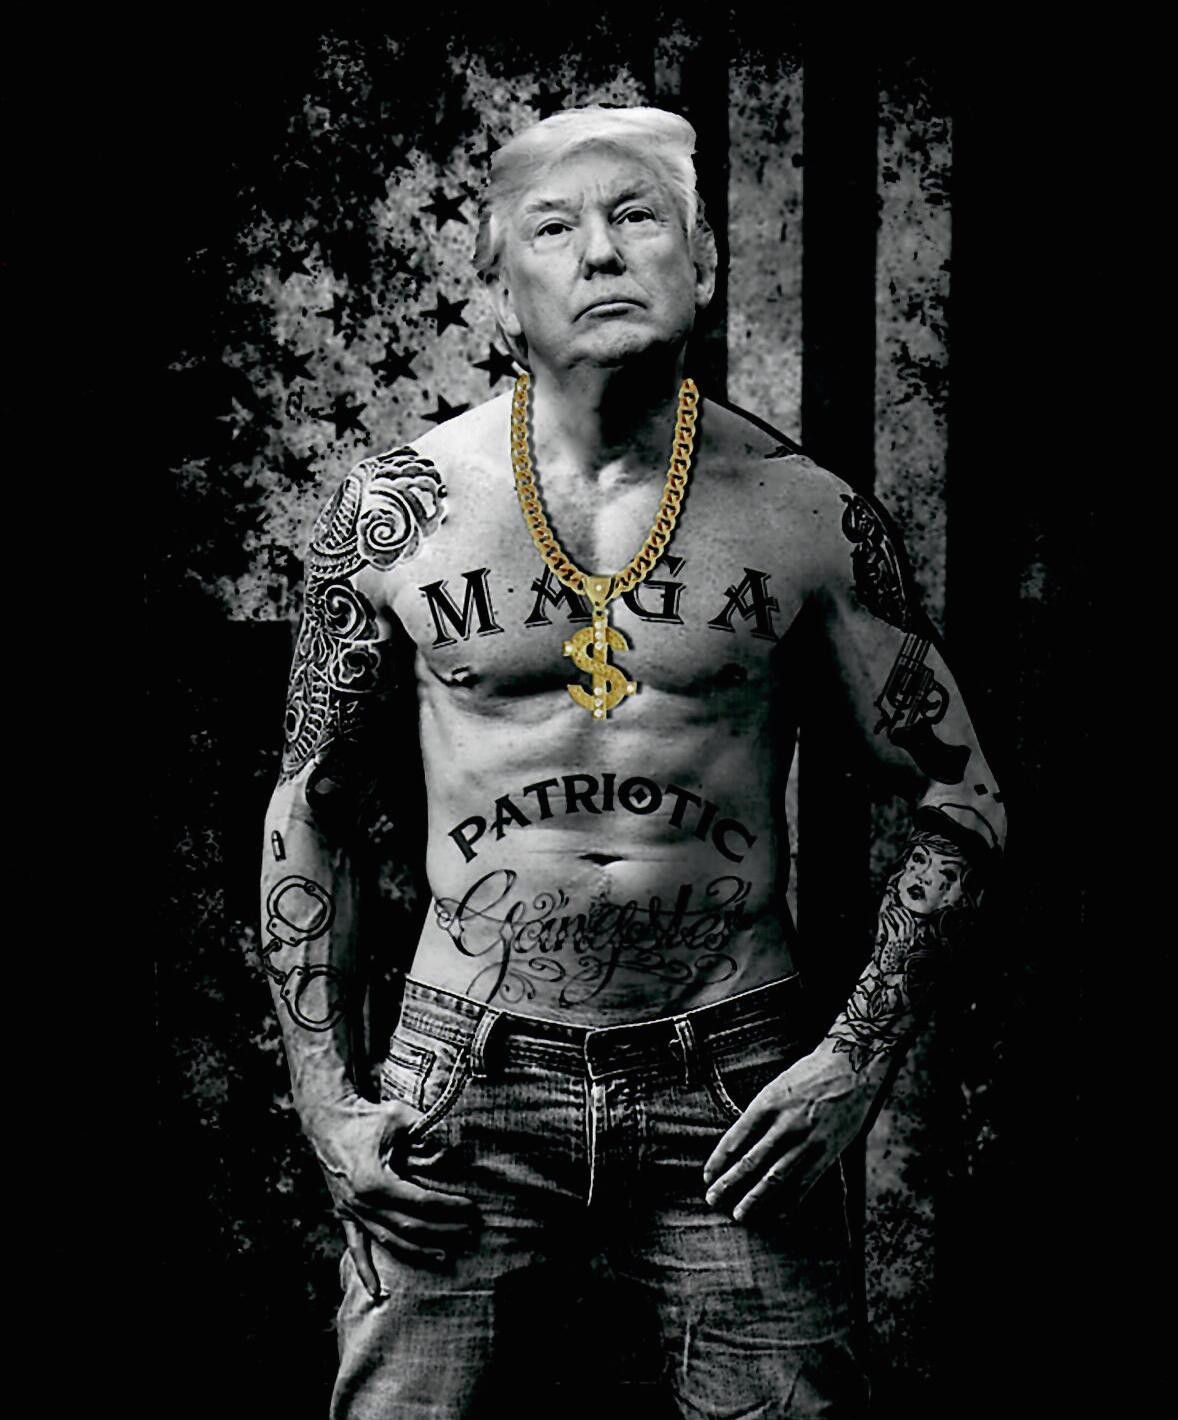 Trump as Gangster